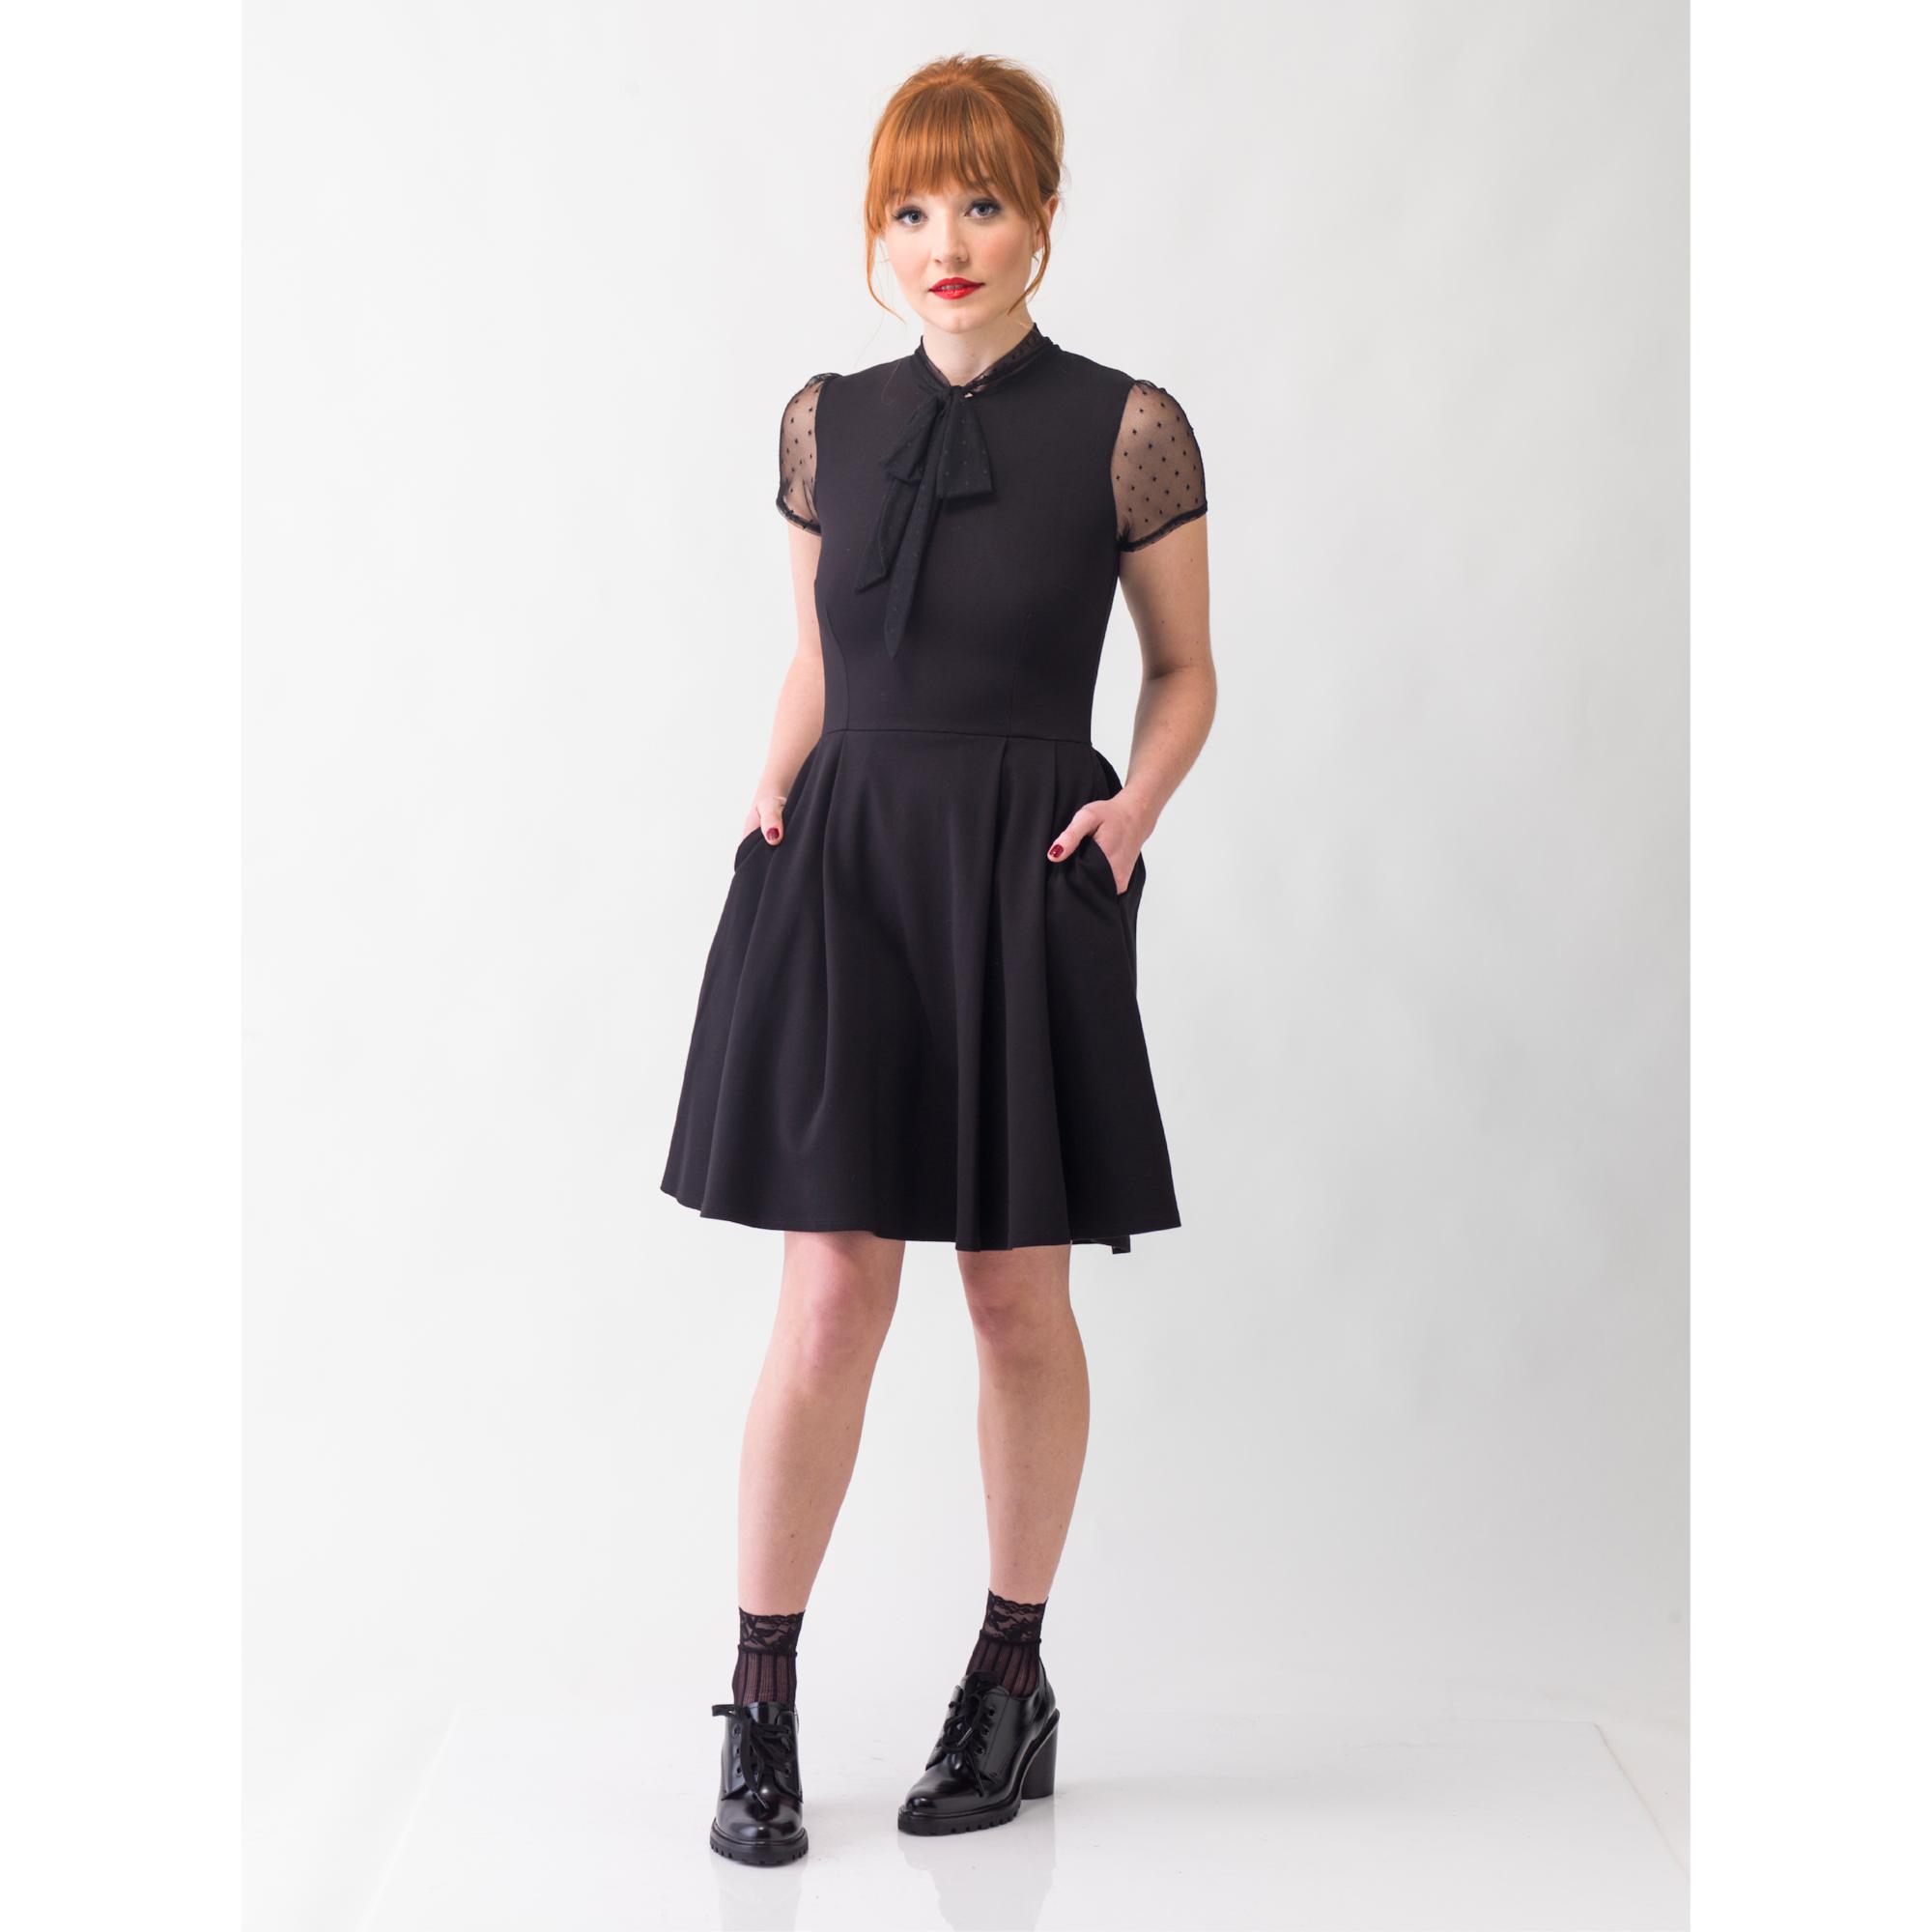 Long Sleeves Sheer Top Little Black Dress Cocktail Dress 26152900 Little Black Dress Cocktail Dress Classy Black Cocktail Dress [ 1500 x 996 Pixel ]